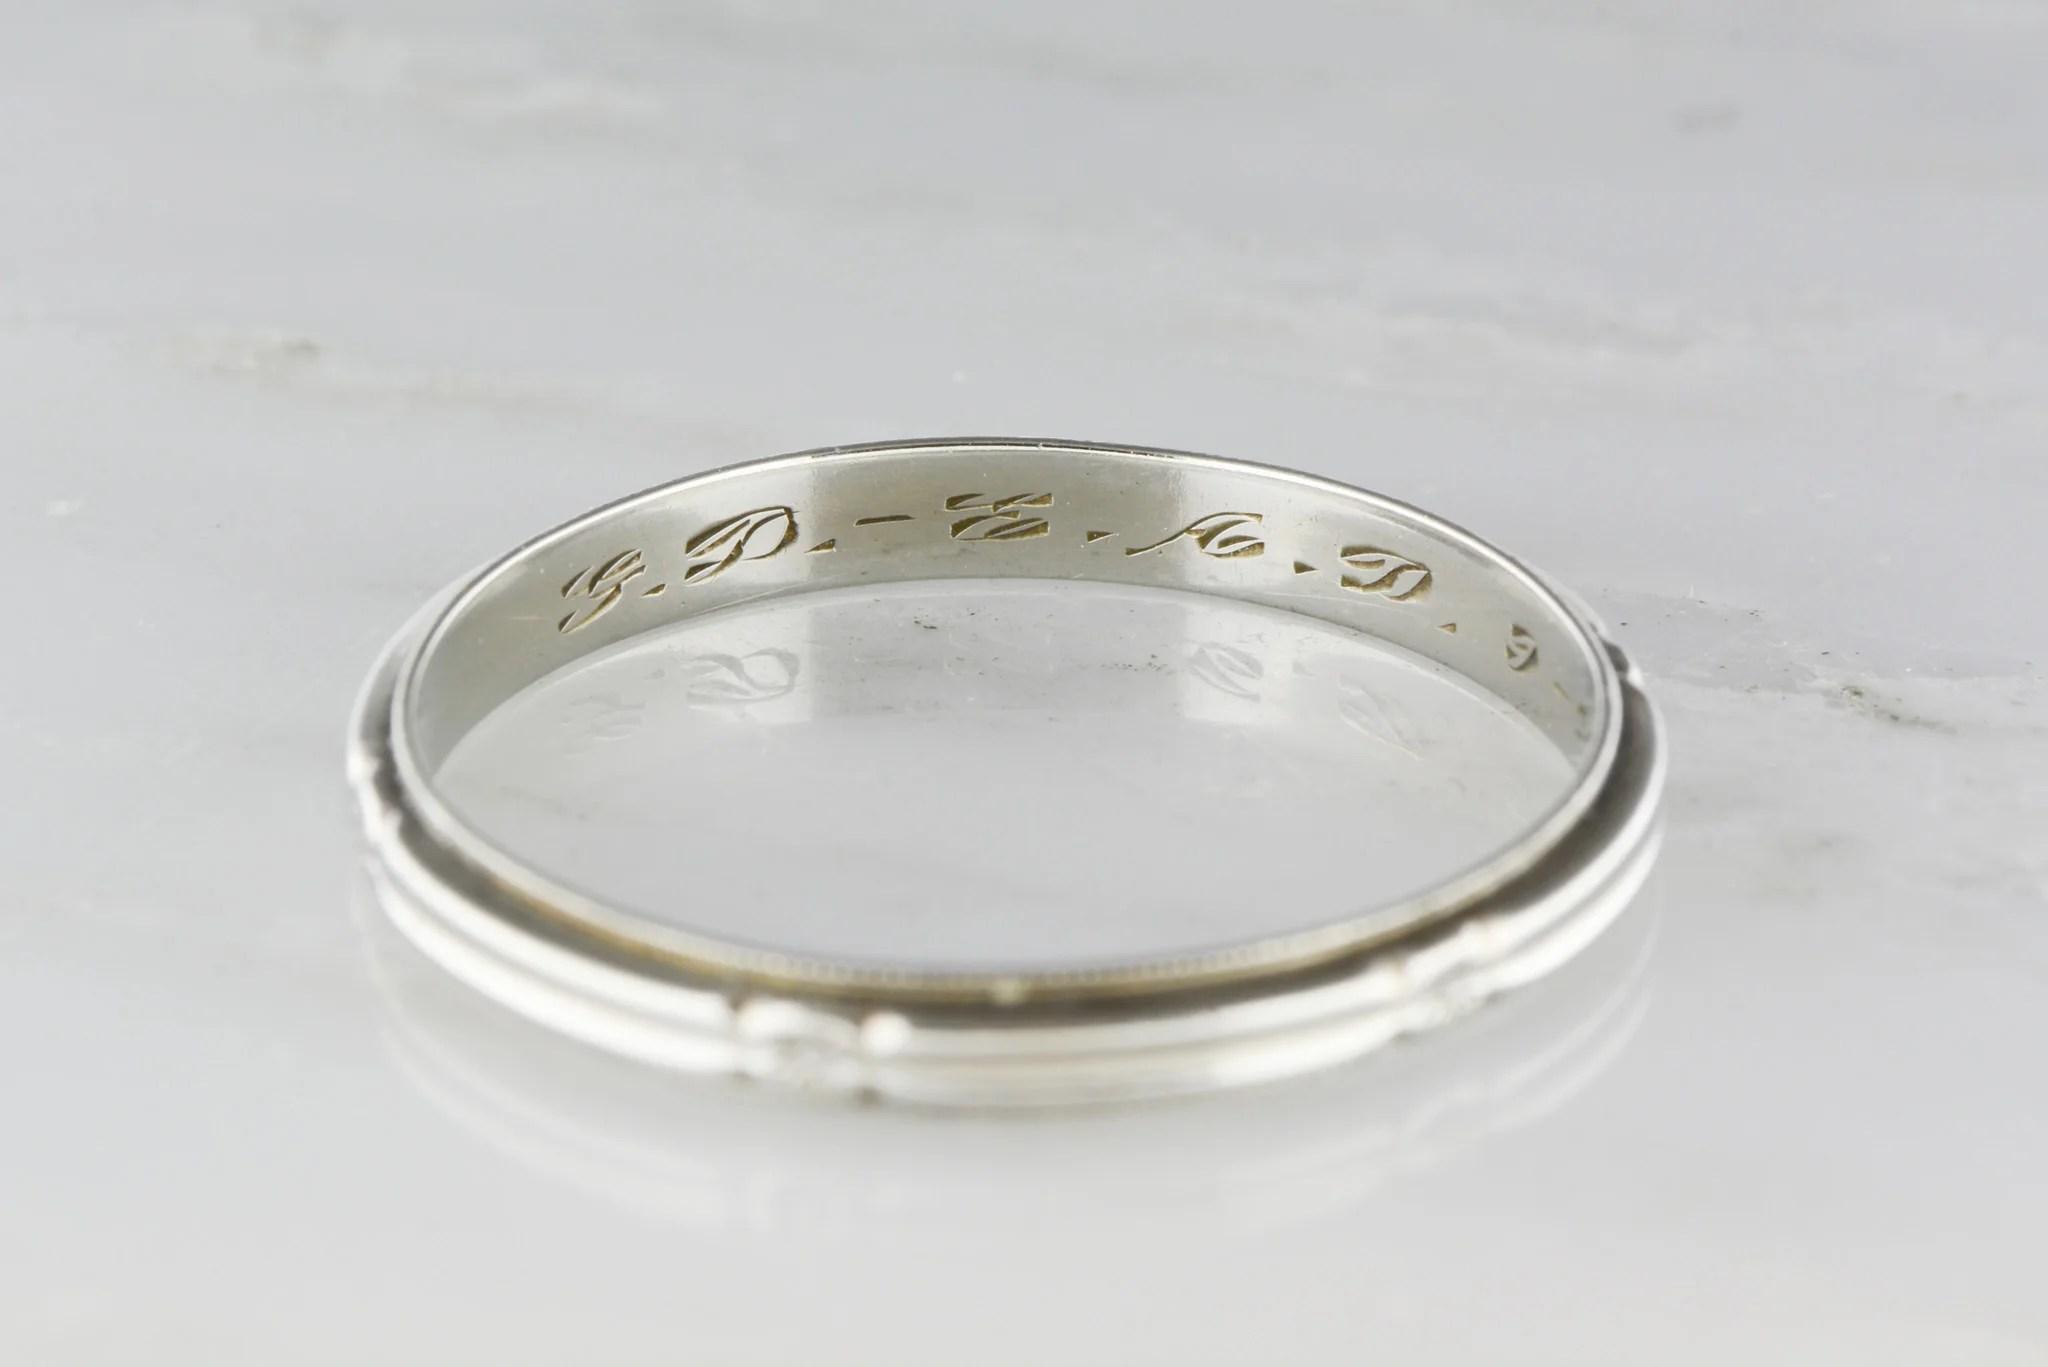 art deco band art deco wedding ring Antique Men s 14K White Gold Art Deco Wedding Band Engraved 9 24 34 TS